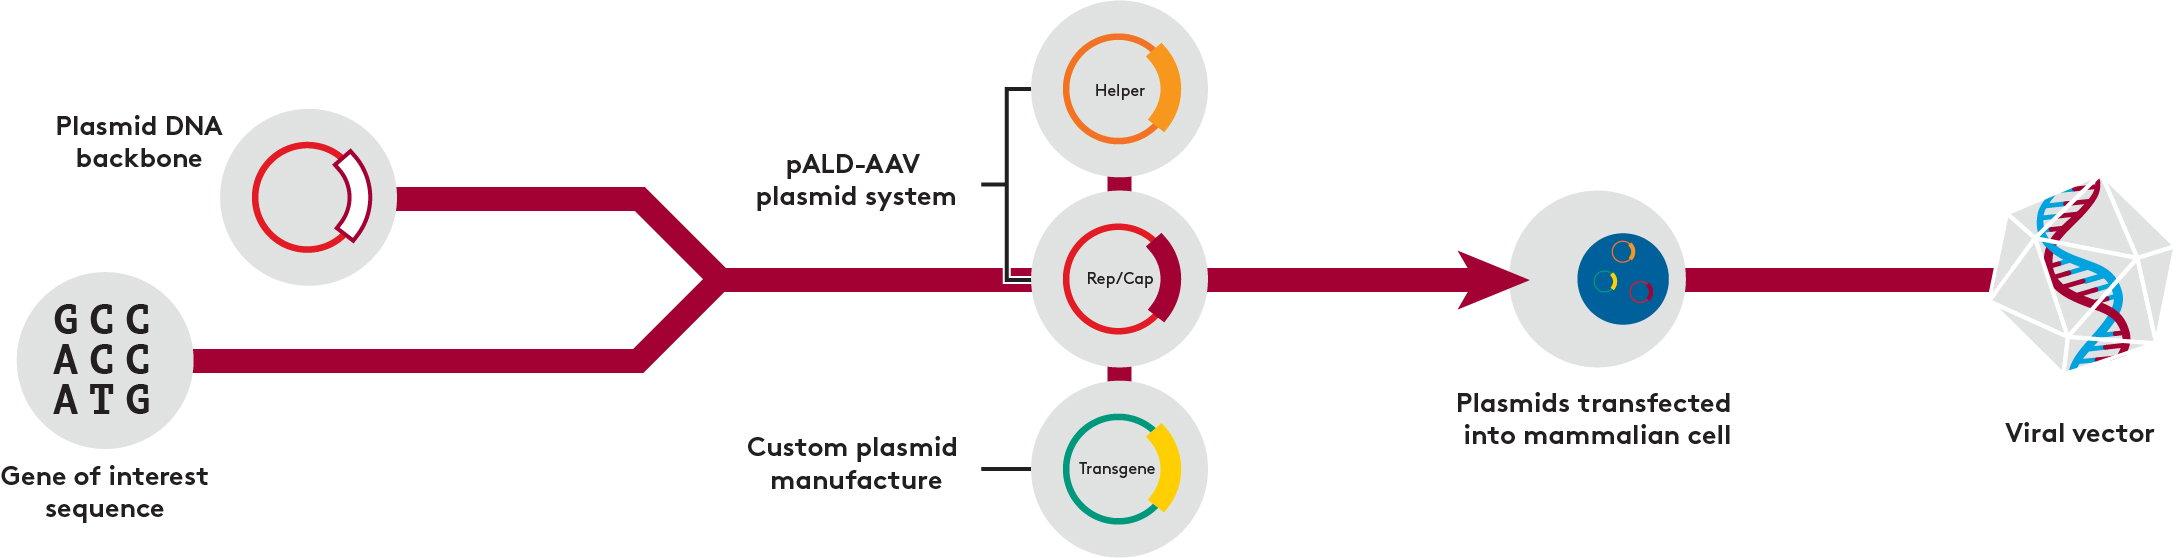 pALD AAV System Process Illustration